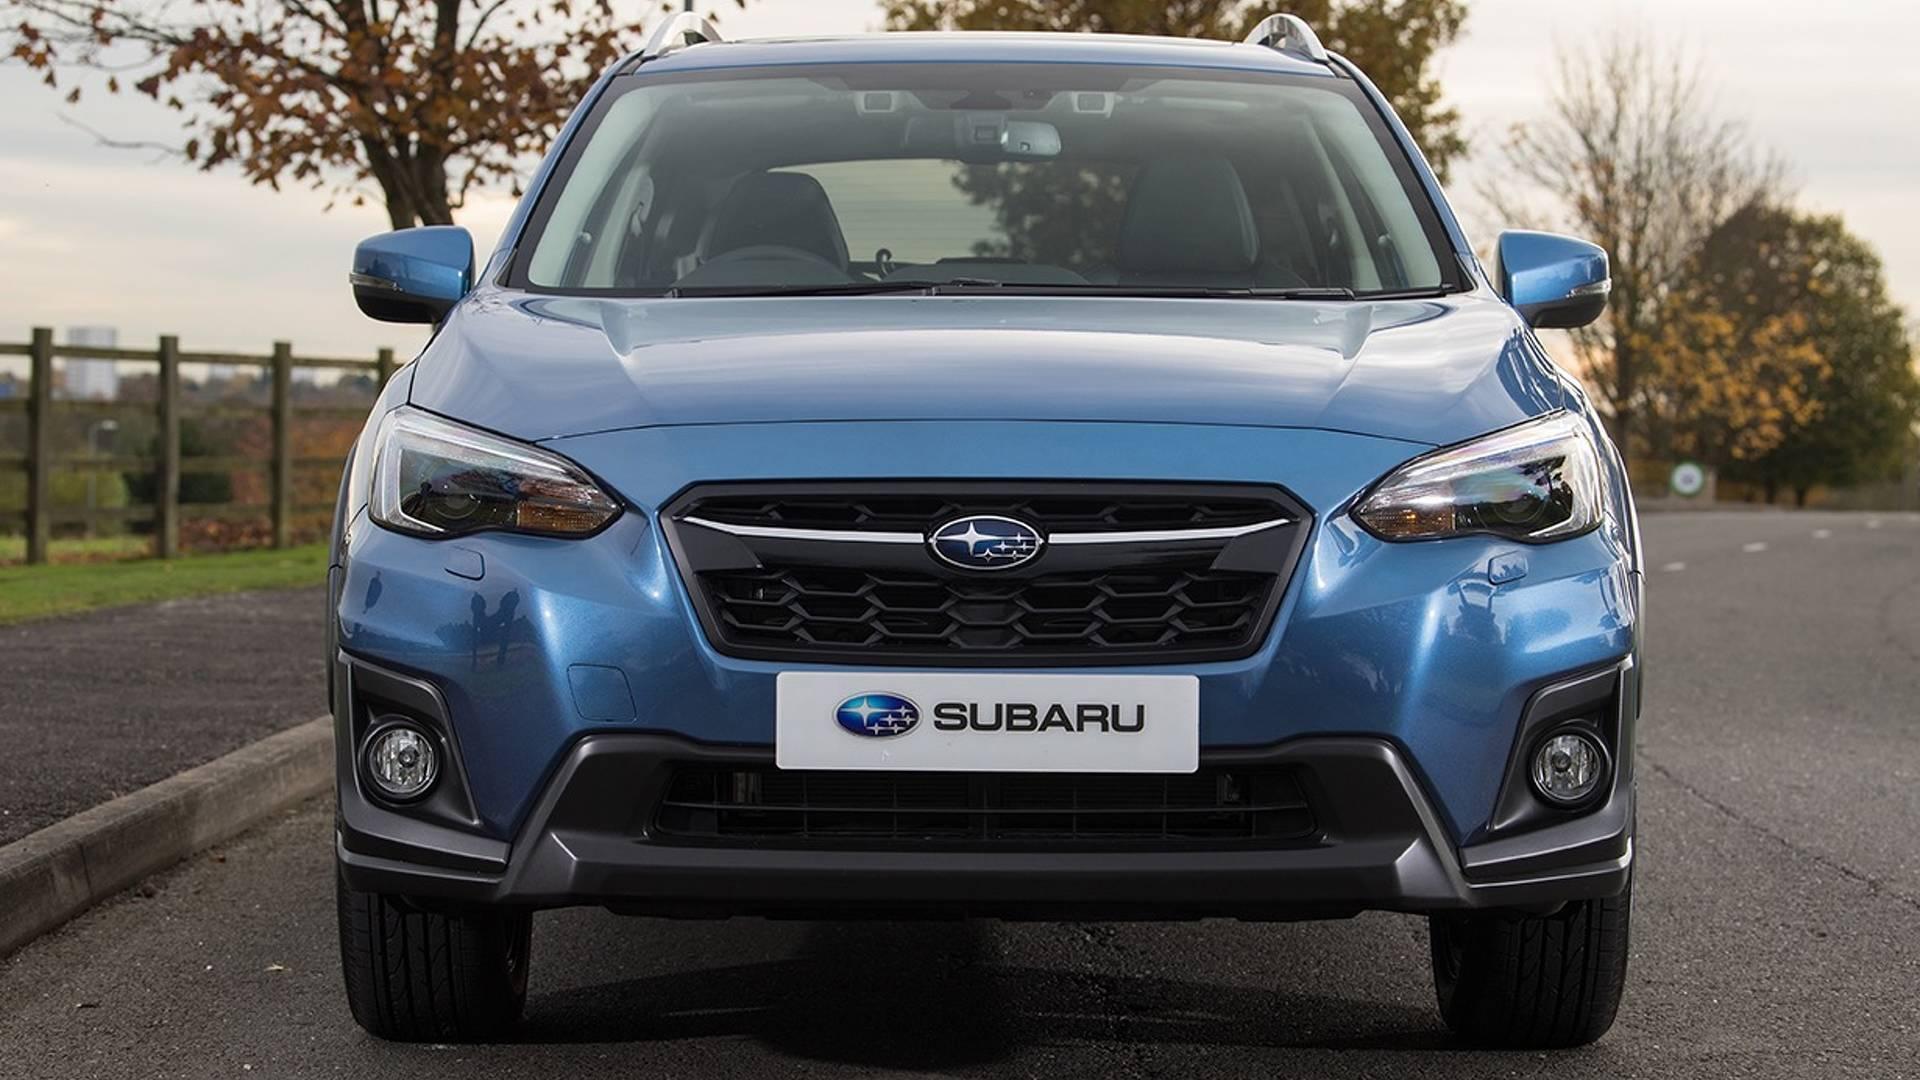 2018 Subaru XV 2 0i first drive Safe but mediocre